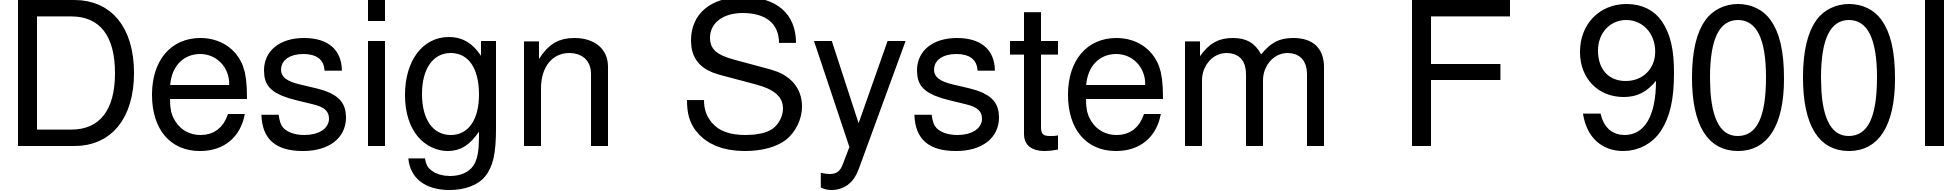 Design System F 900I